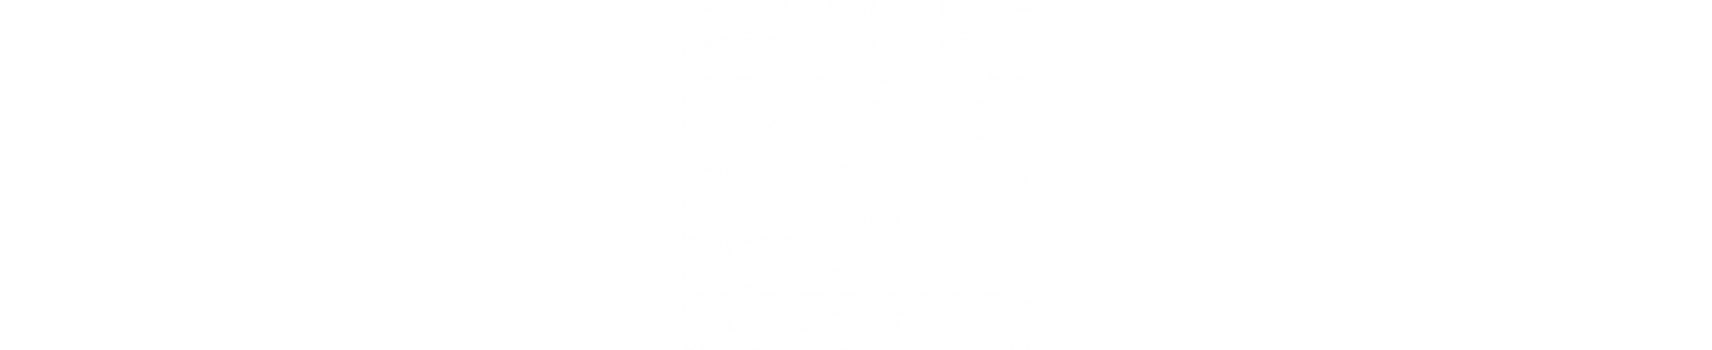 Rosácea - cuperosis